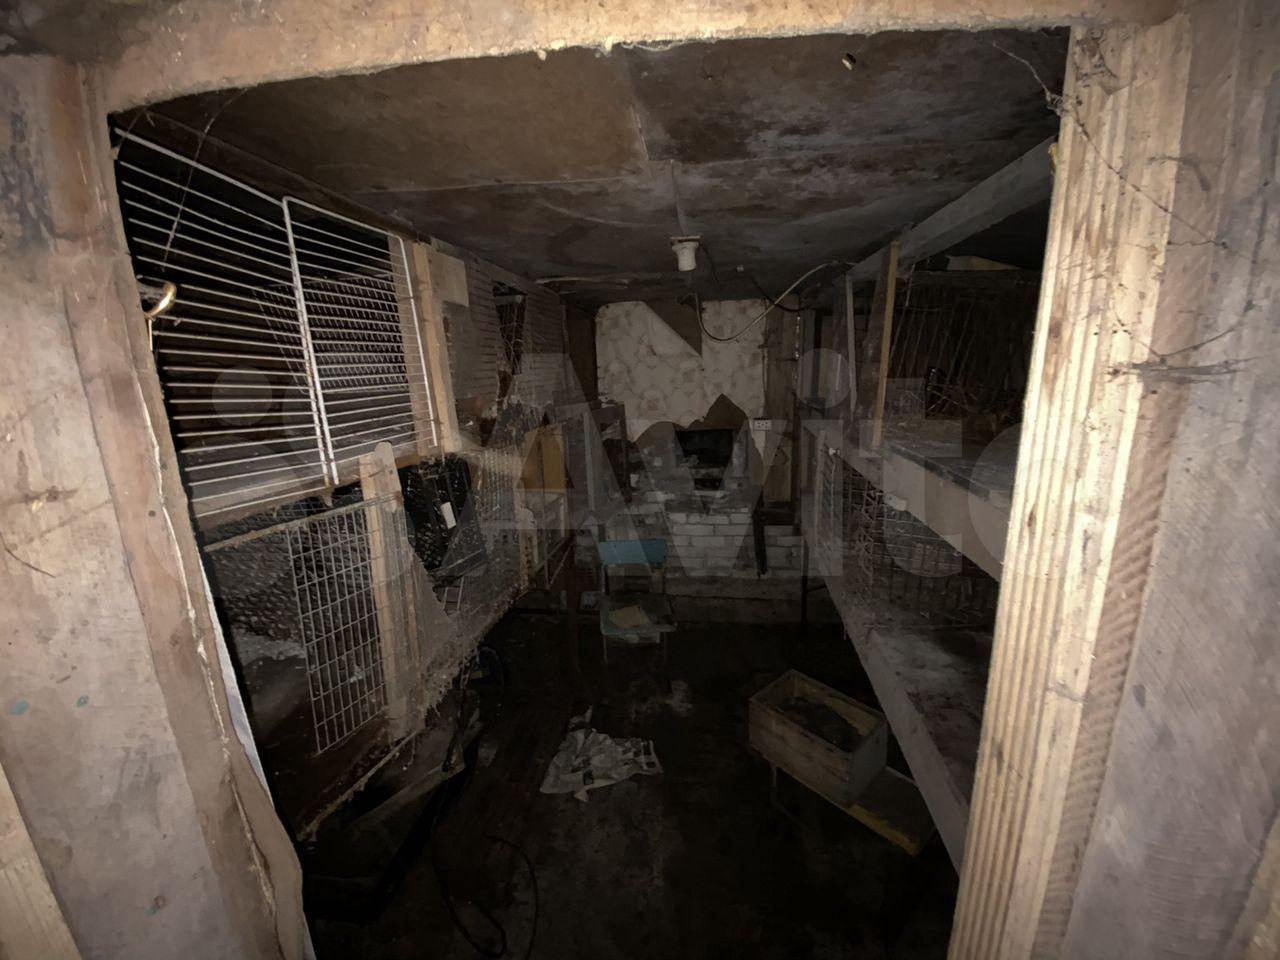 30 м² в Набережных Челнах> Гараж, > 30 м²